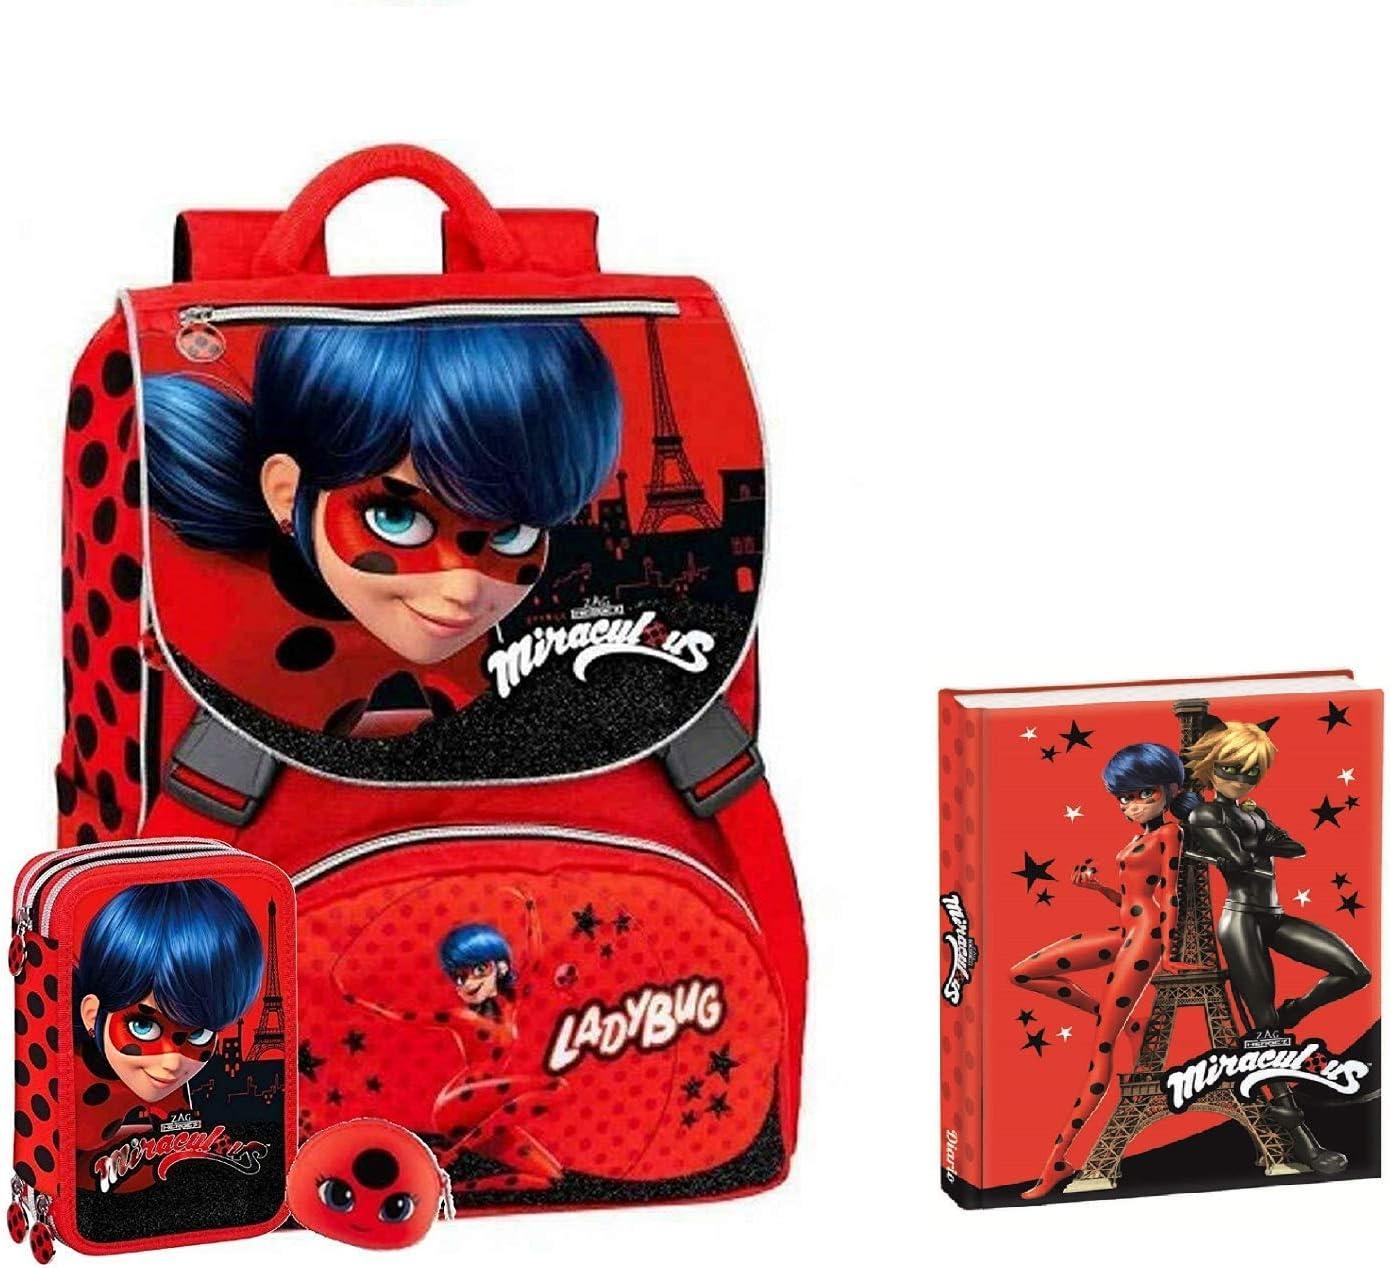 Schoolpack Mochila Escolar Miraculous Ladybug Extensible + Monedero Kiki + Estuche Escolar 3 Cremallera Rojo + Diario Escolar No Fecha 13 x 18 cm Cuadros Rojo Negro Glitter Chat Negro: Amazon.es: Equipaje